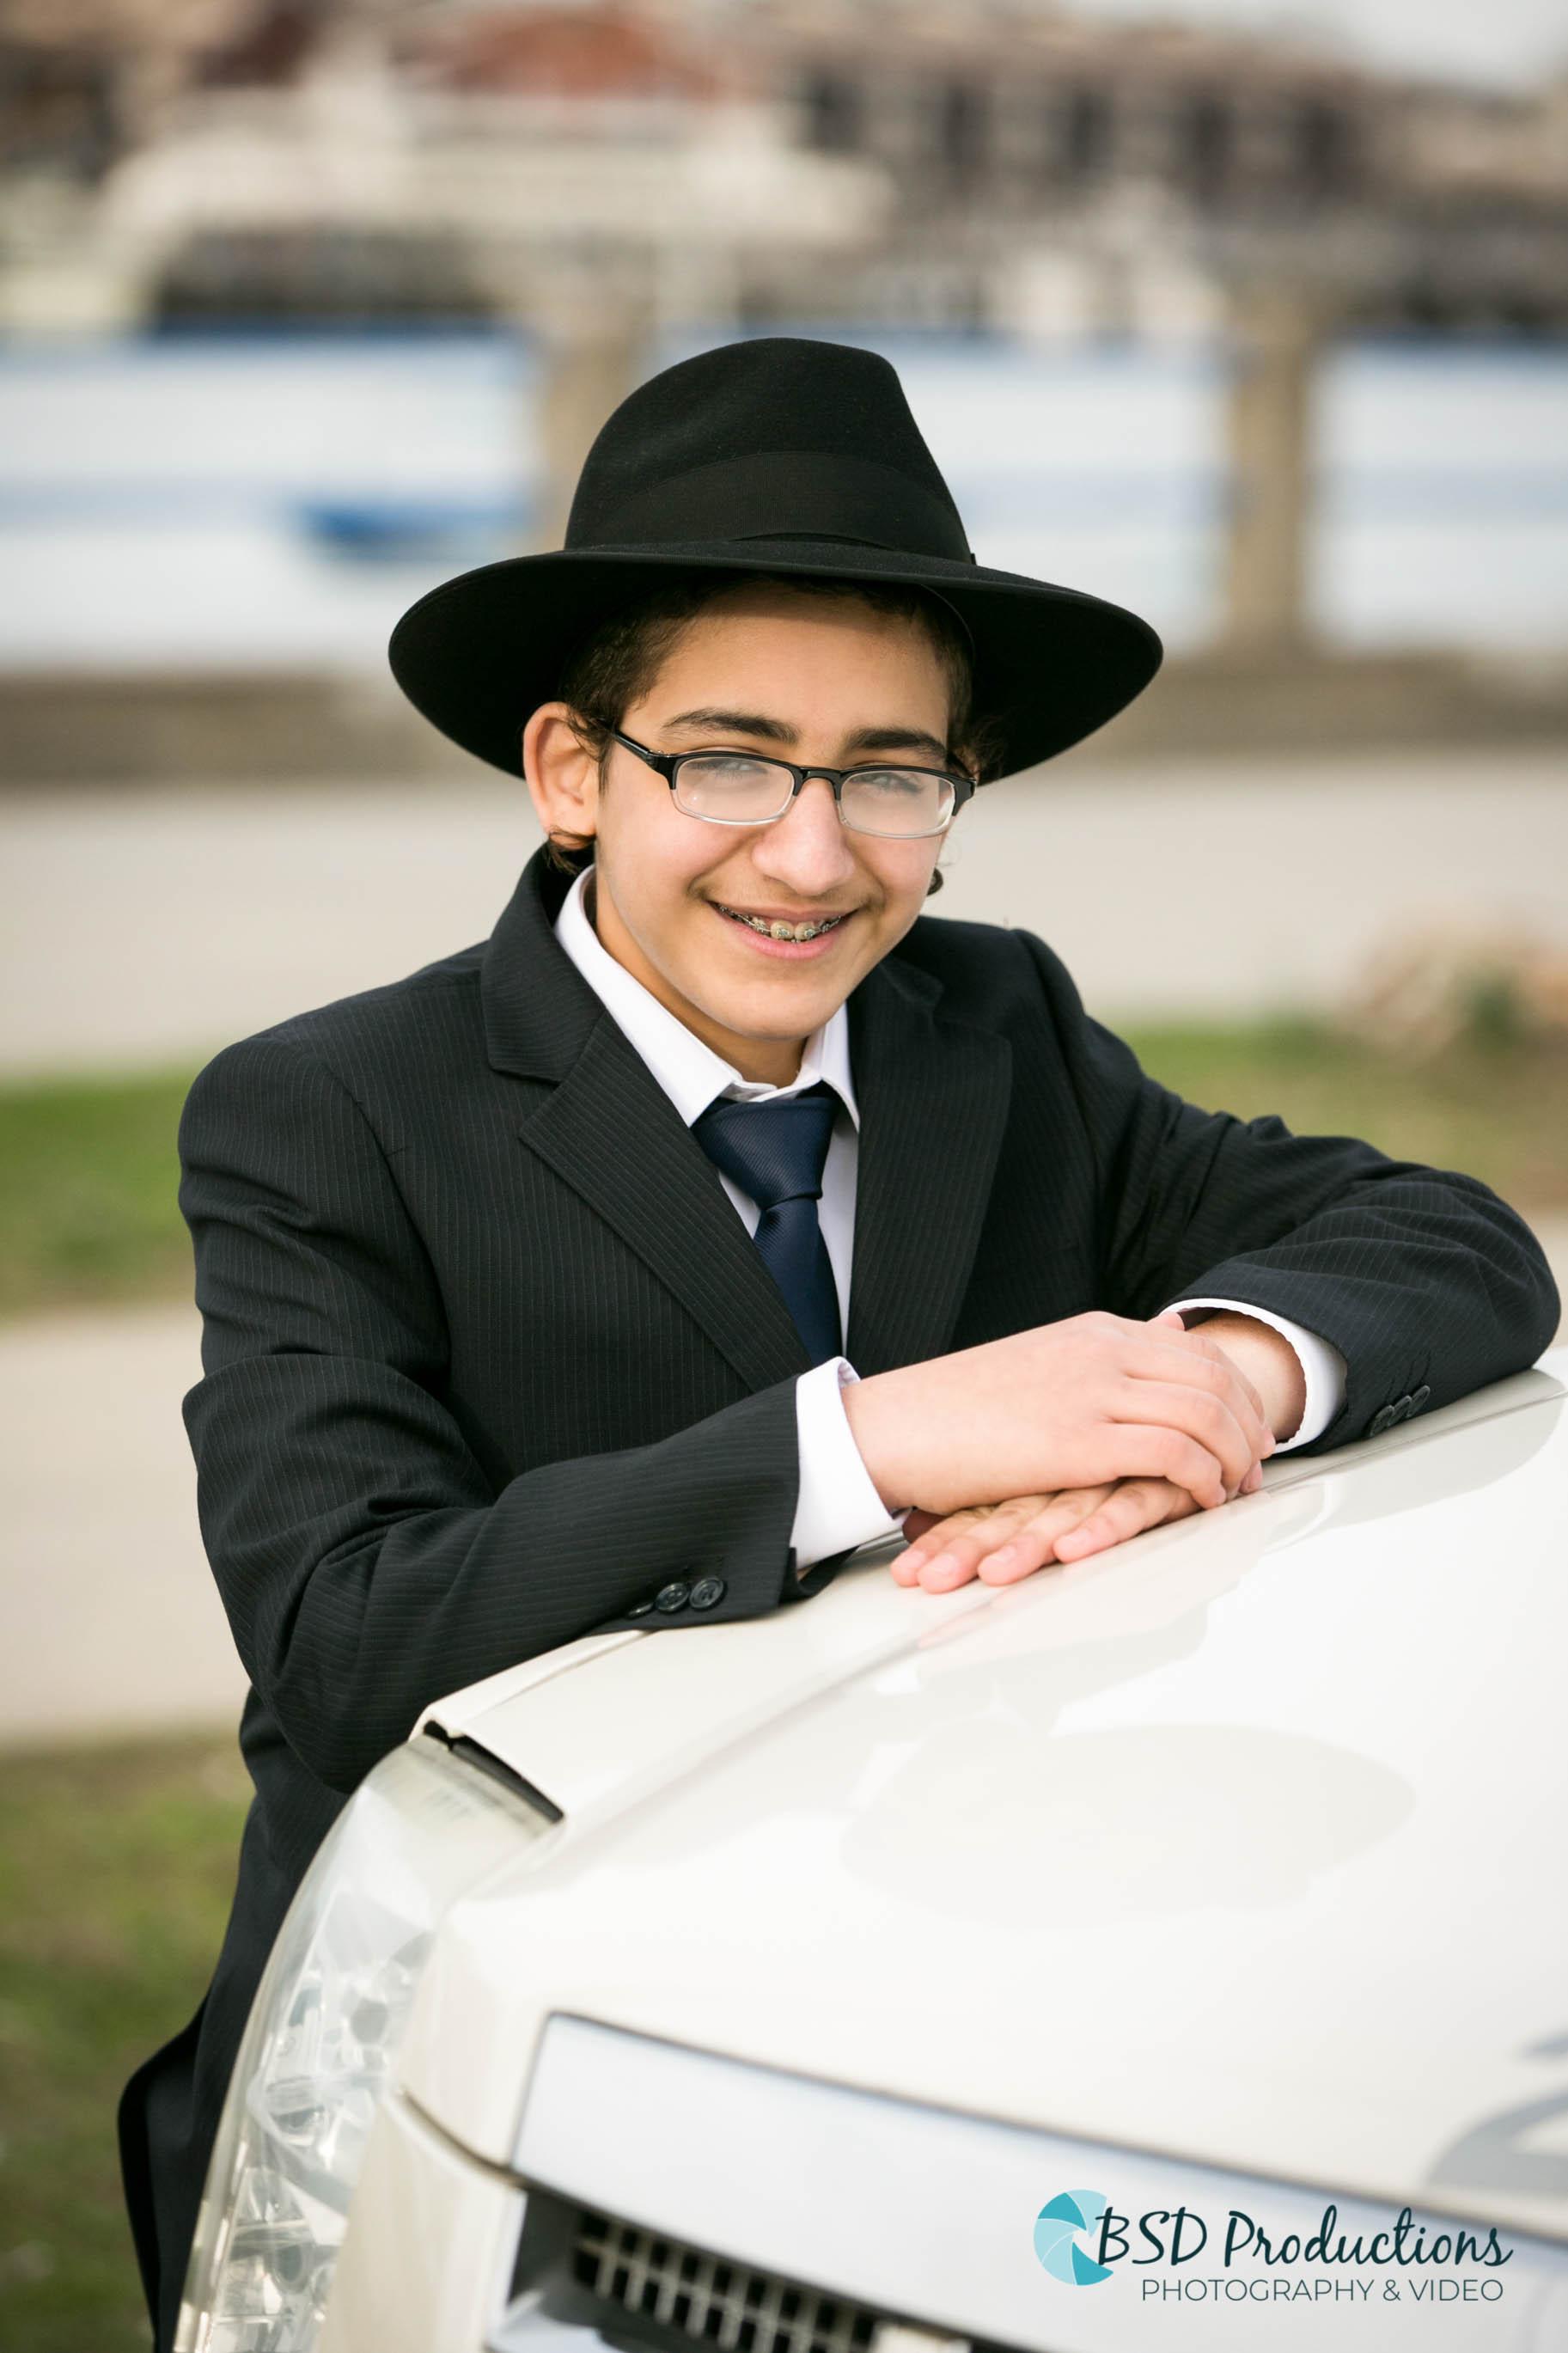 UH5A9237 Bar Mitzvah – BSD Productions Photography